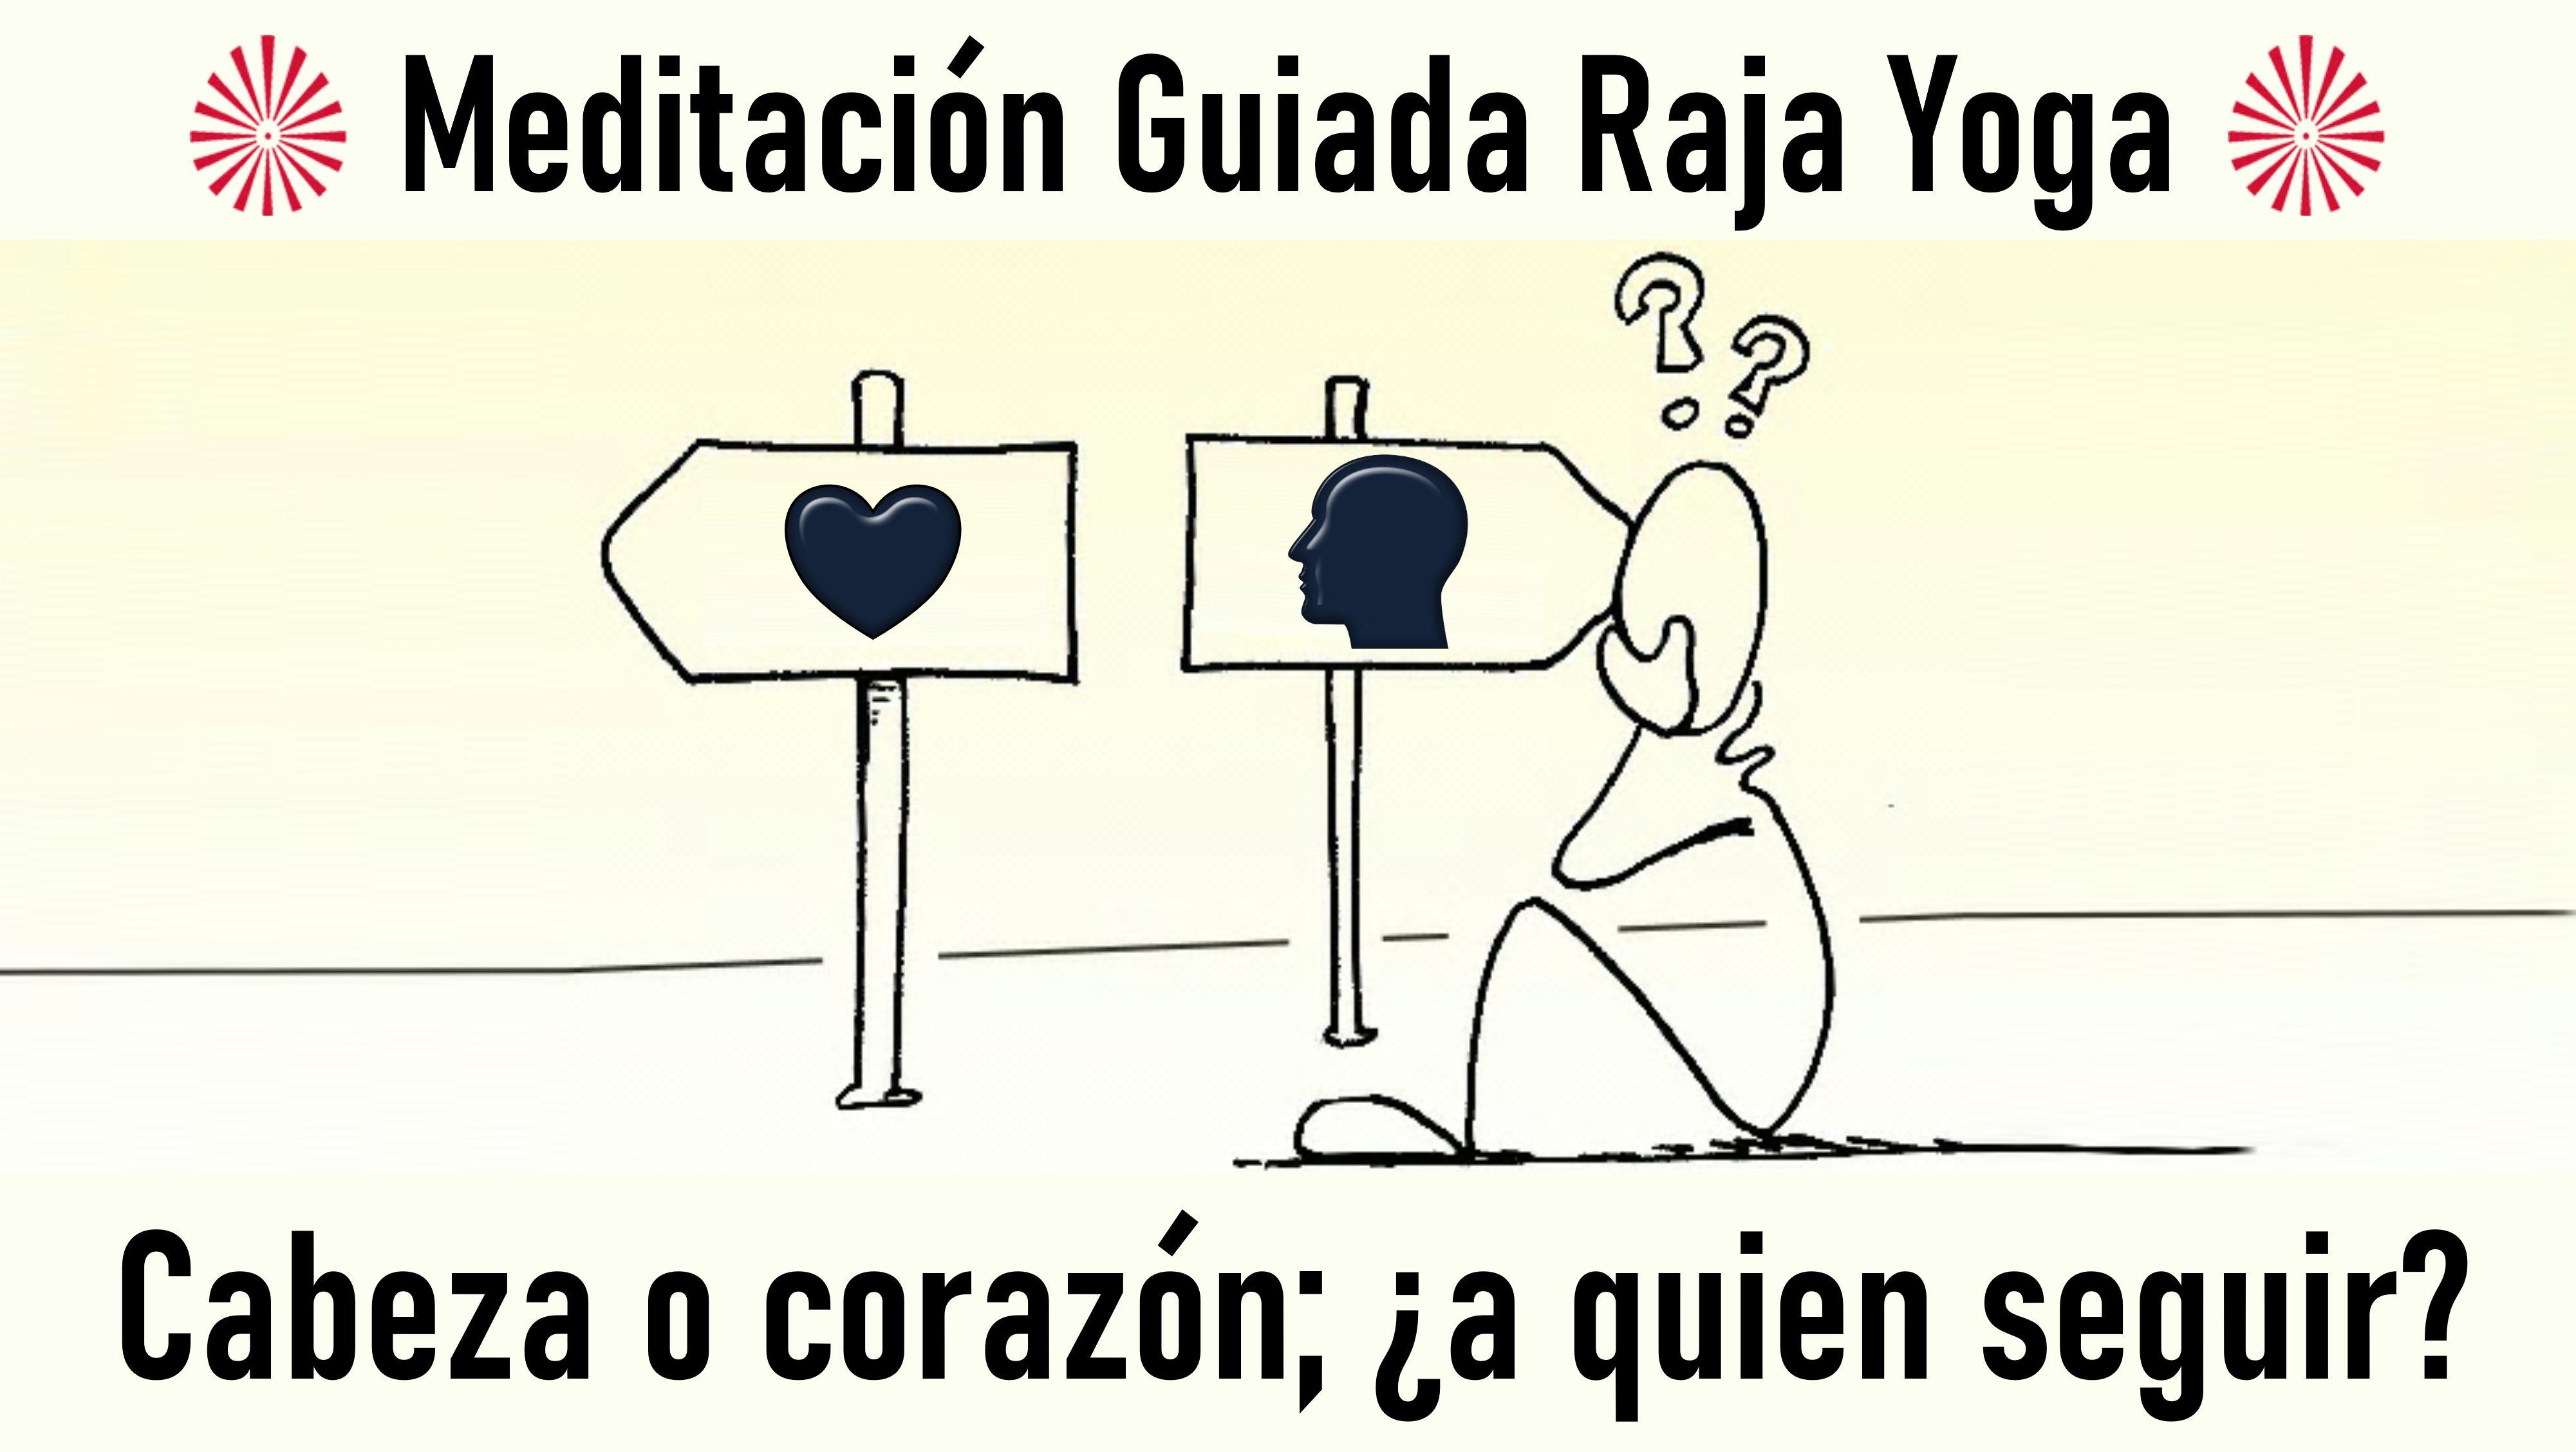 22 Octubre 2020  Meditación guiada:  Cabeza o corazón, ¿a quién seguir?